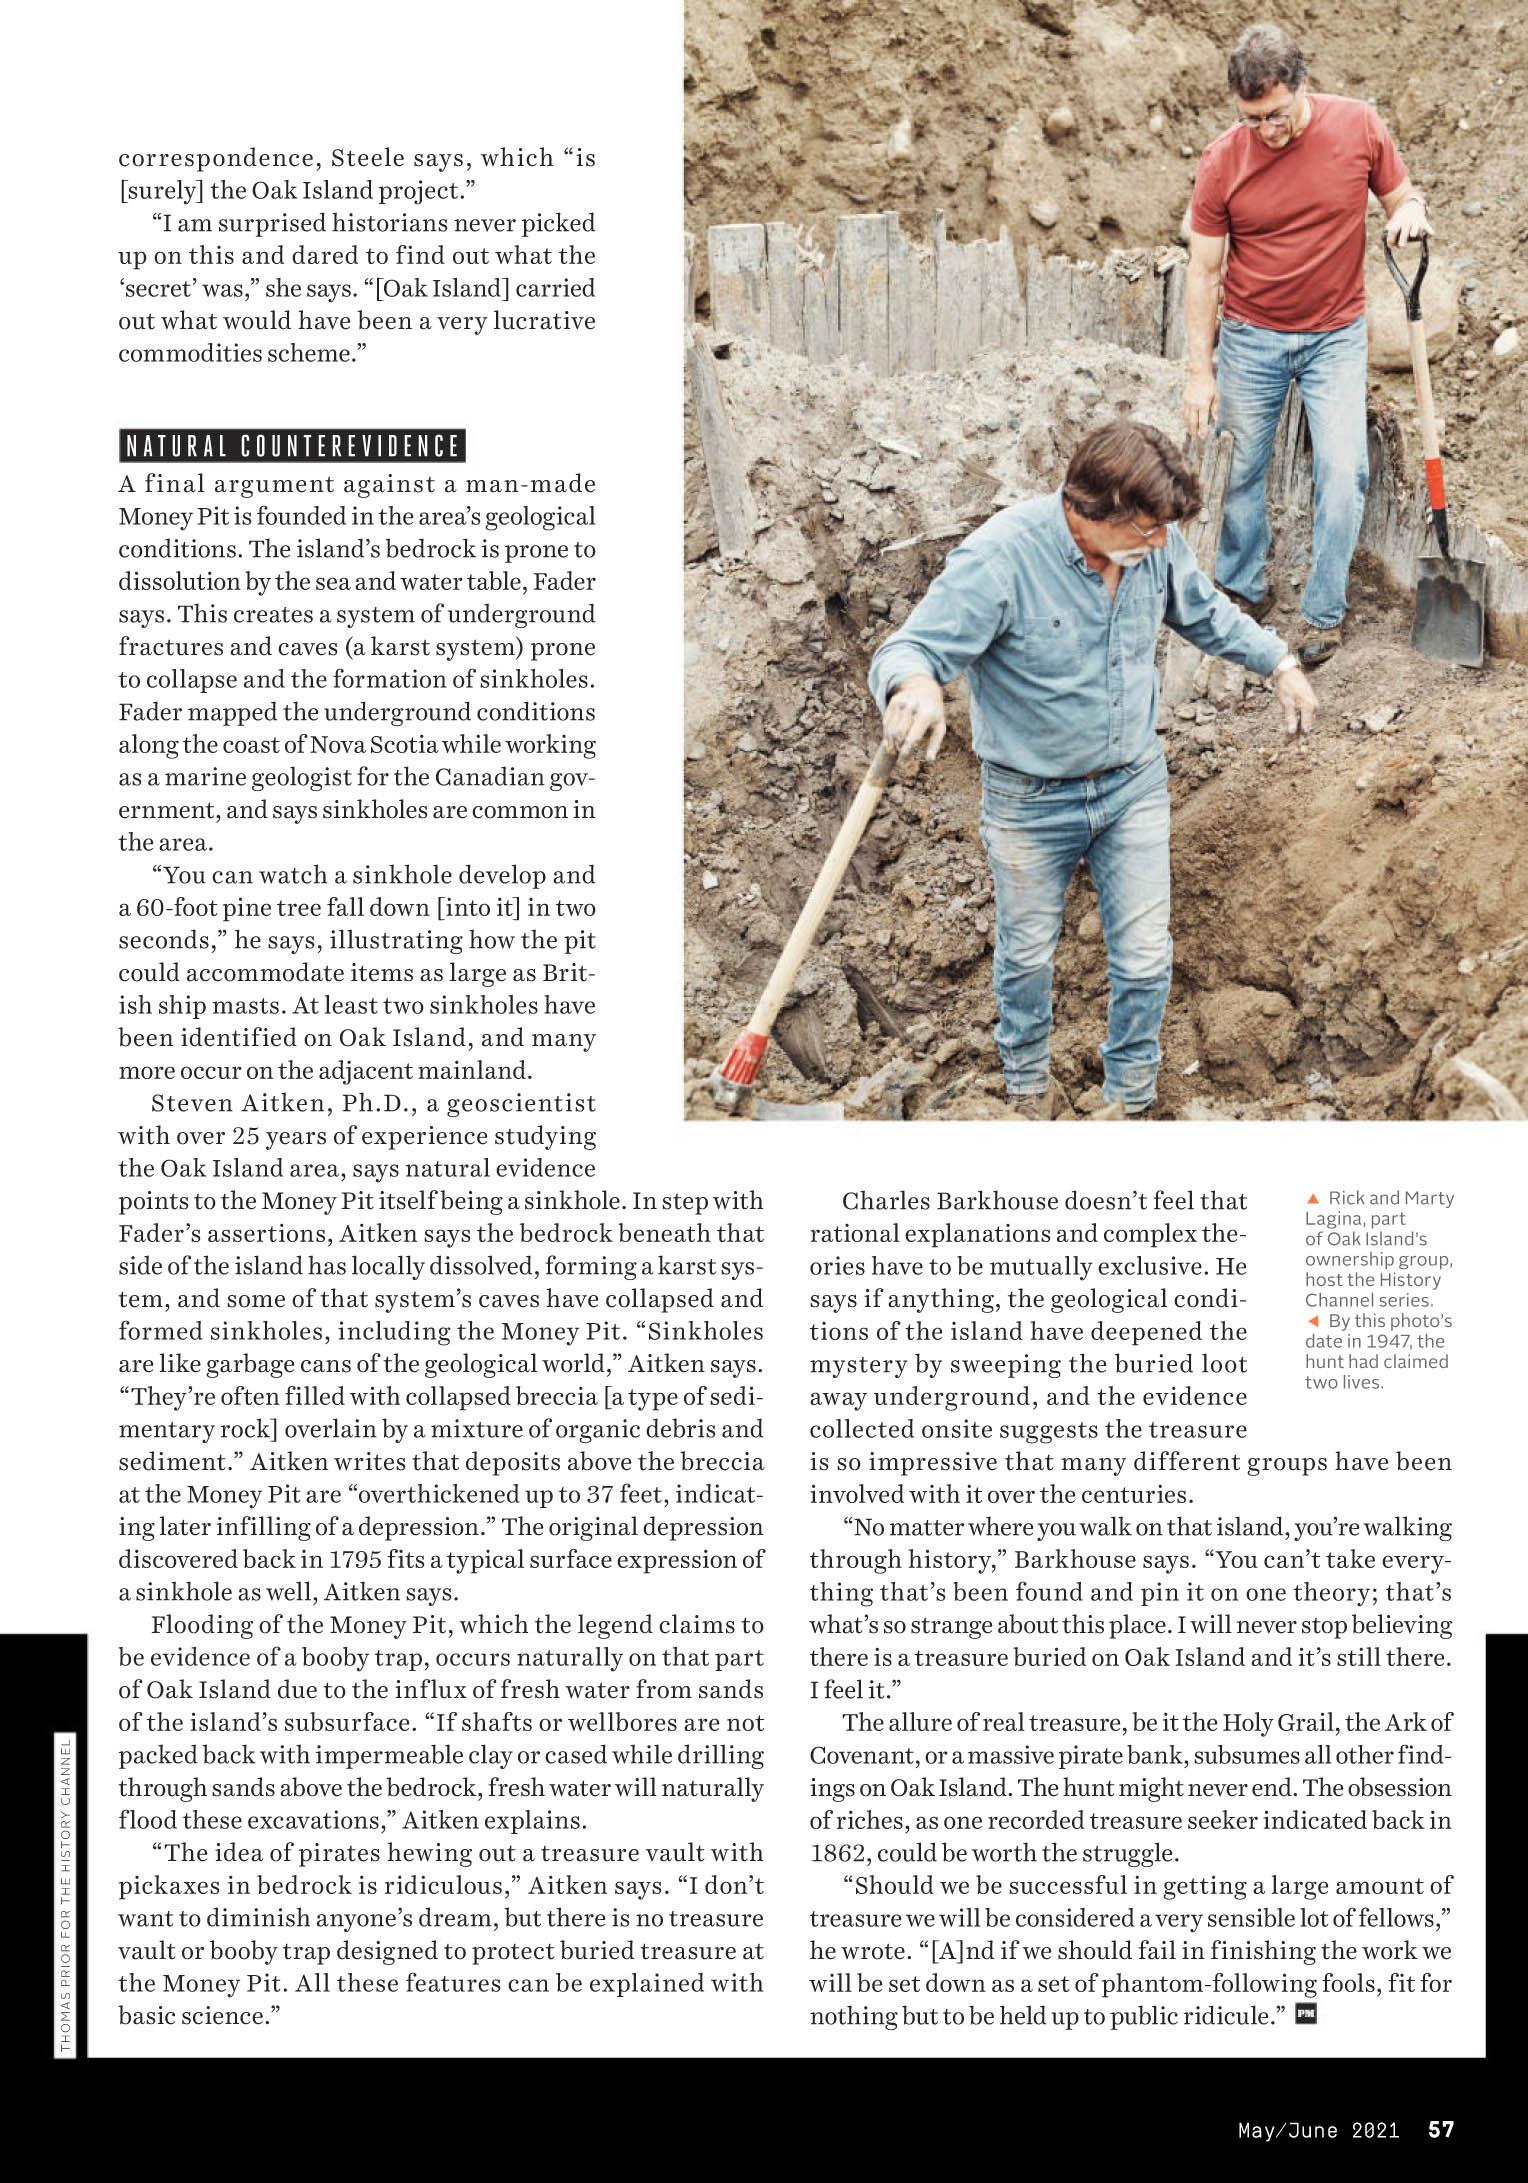 Popular Mechanics 2021-05-06 Oak Island 07.jpg